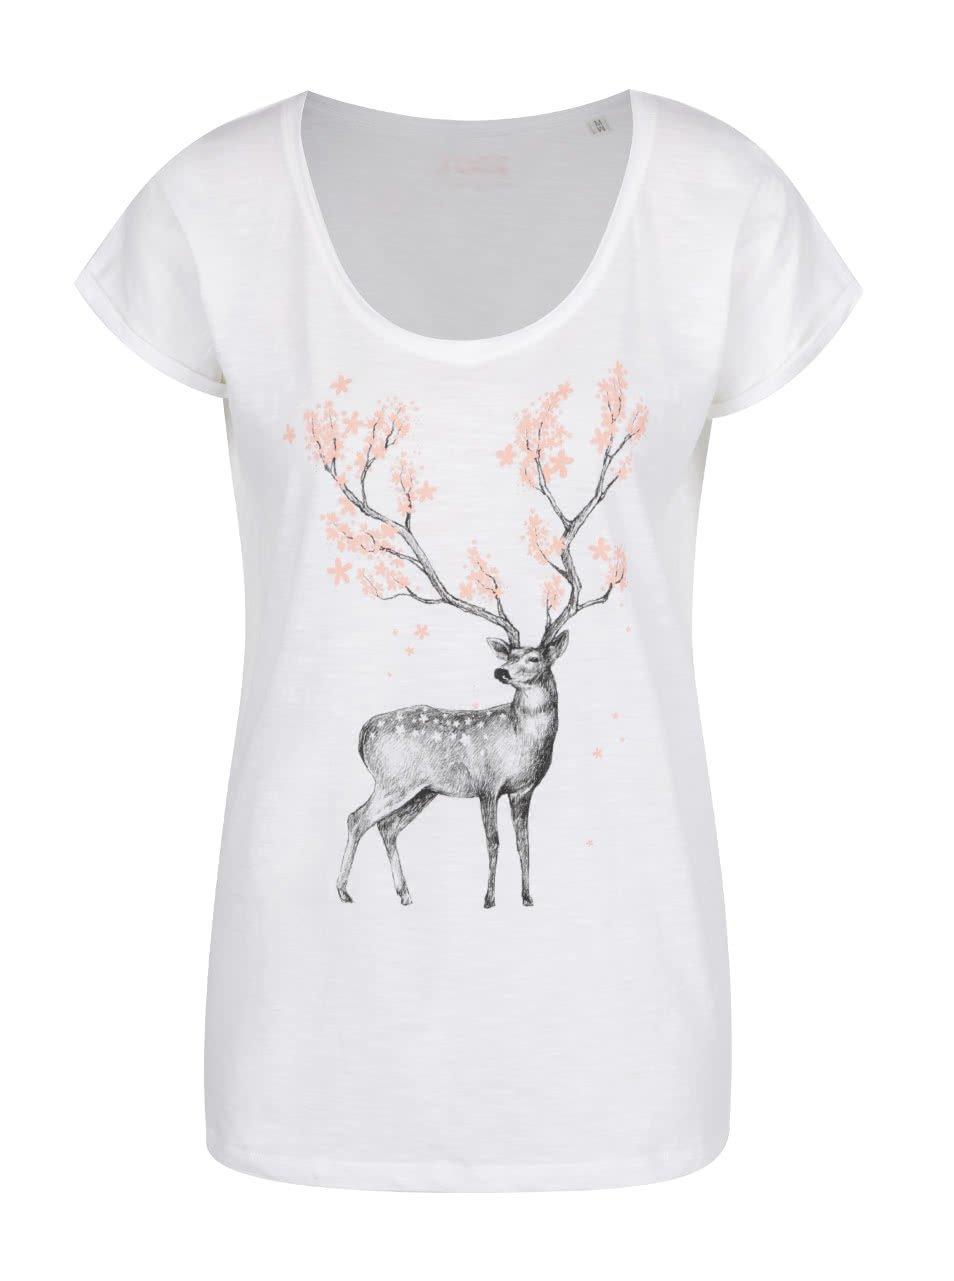 Bílé dámské triko ZOOT Originál Blossoming deer